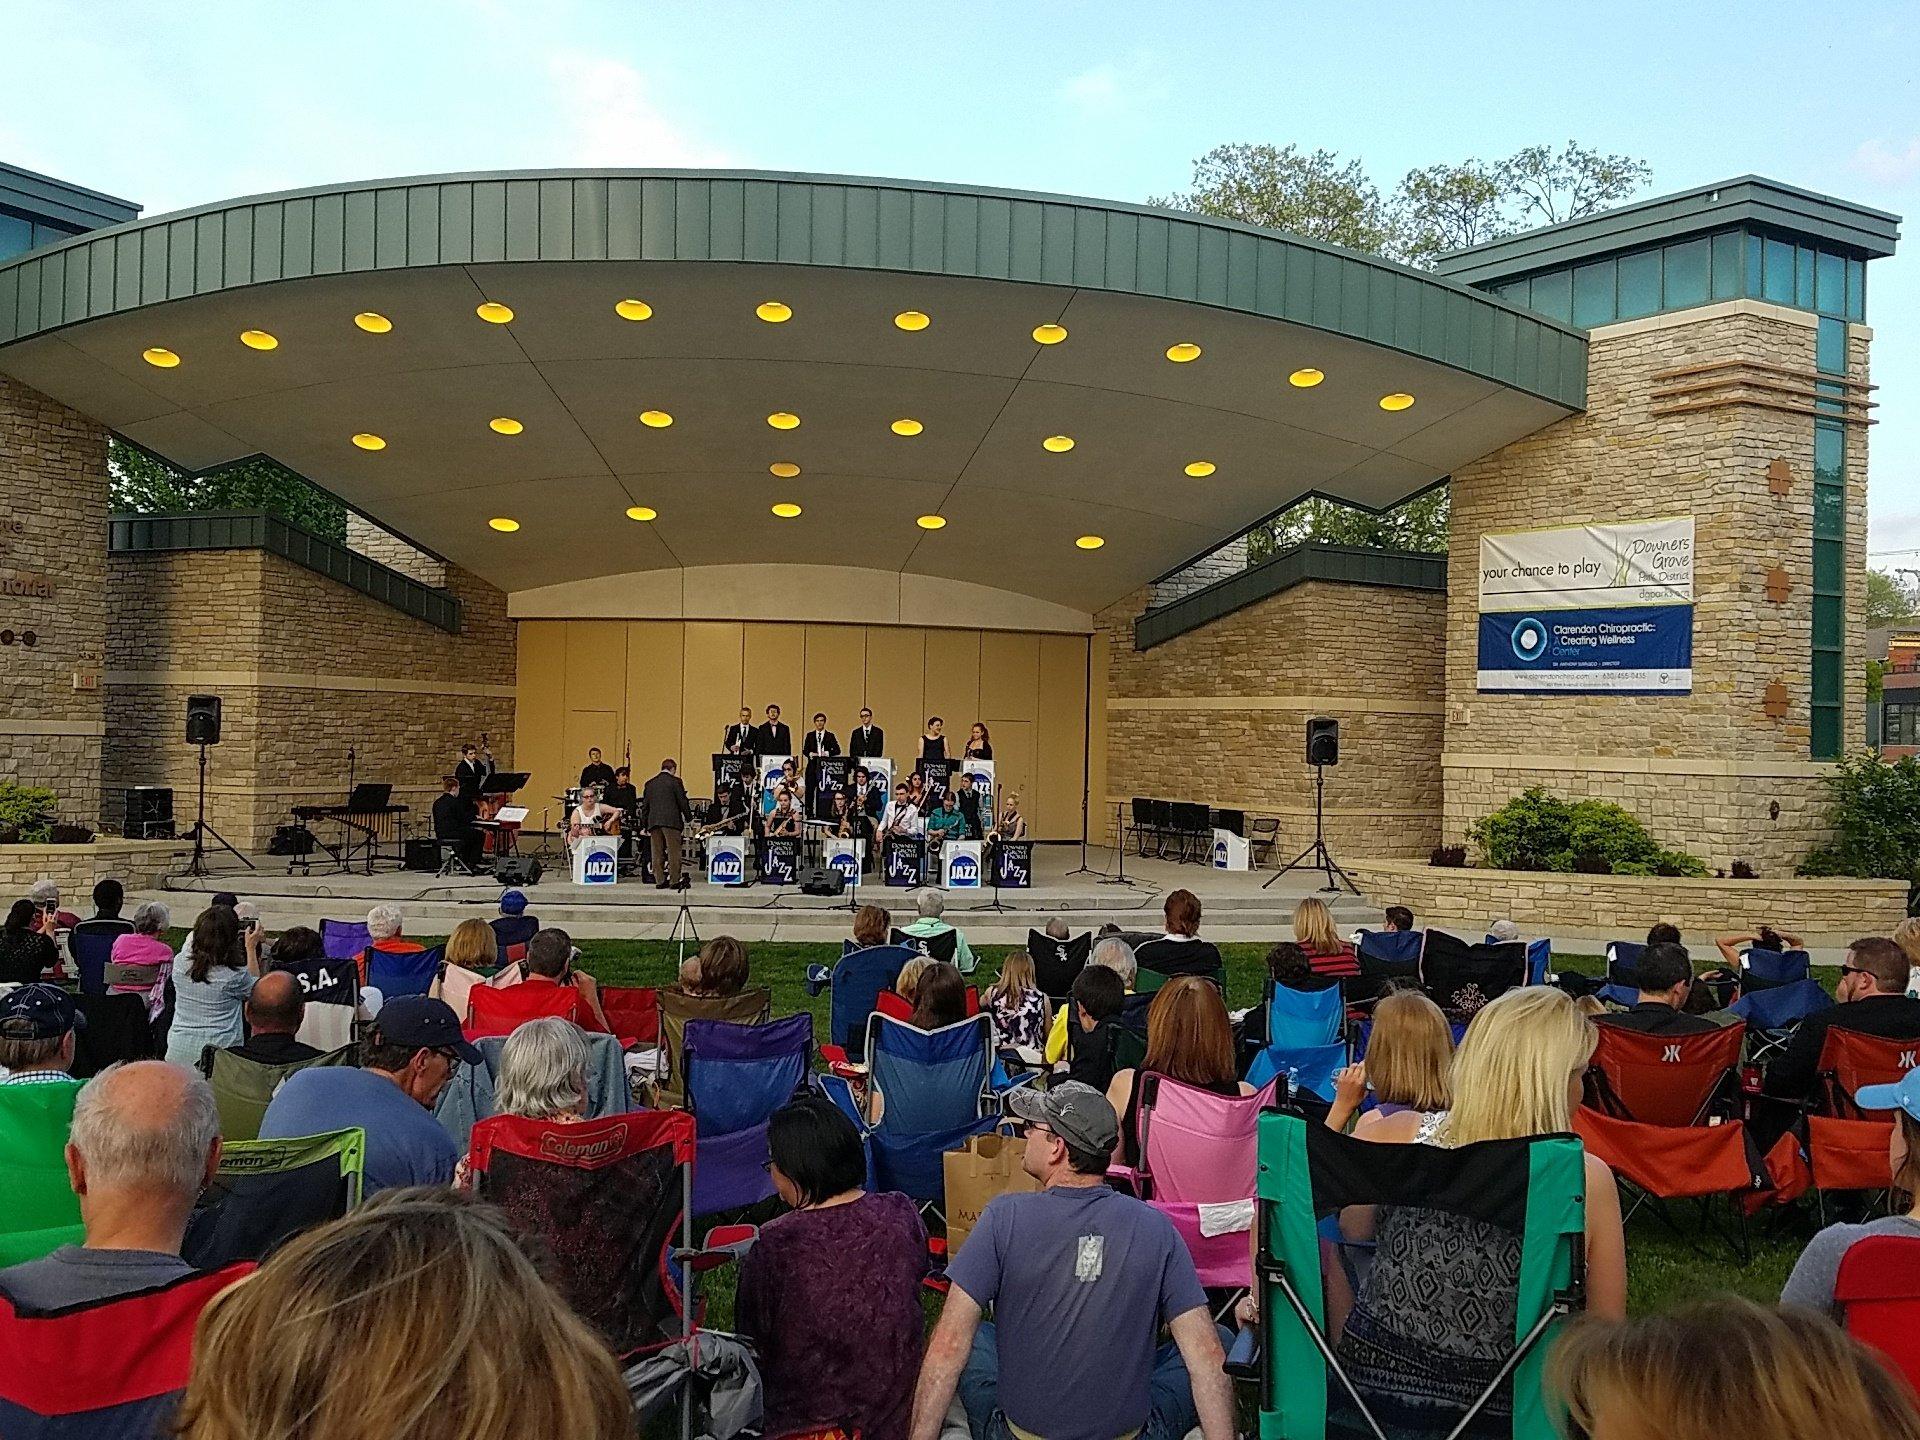 Full house @d99 jazz concert #weareDGN @DGNFineArts https://t.co/uNBYGqWgsC